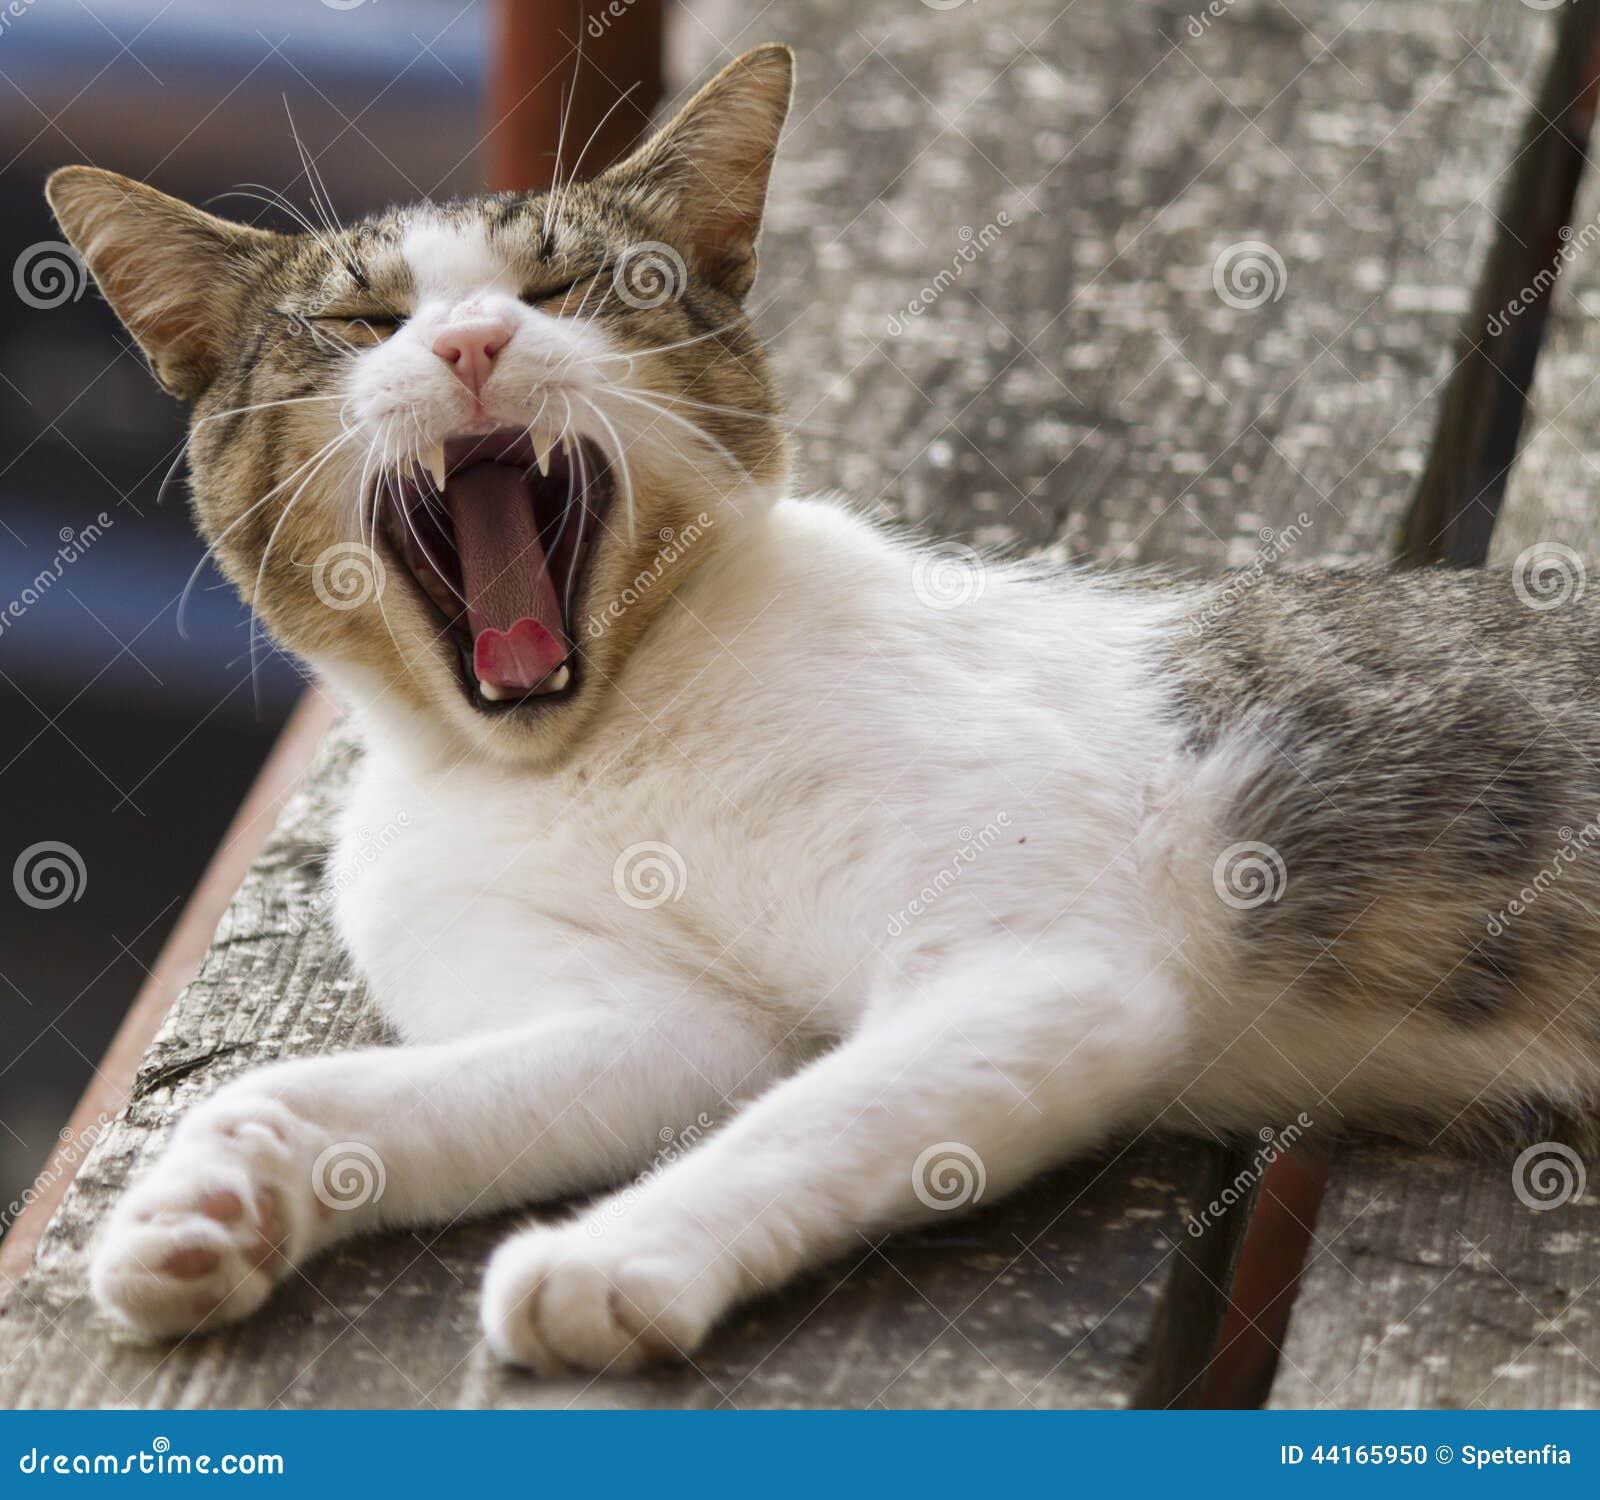 Cute Cat Yawning Stock Photo - Image: 44165950